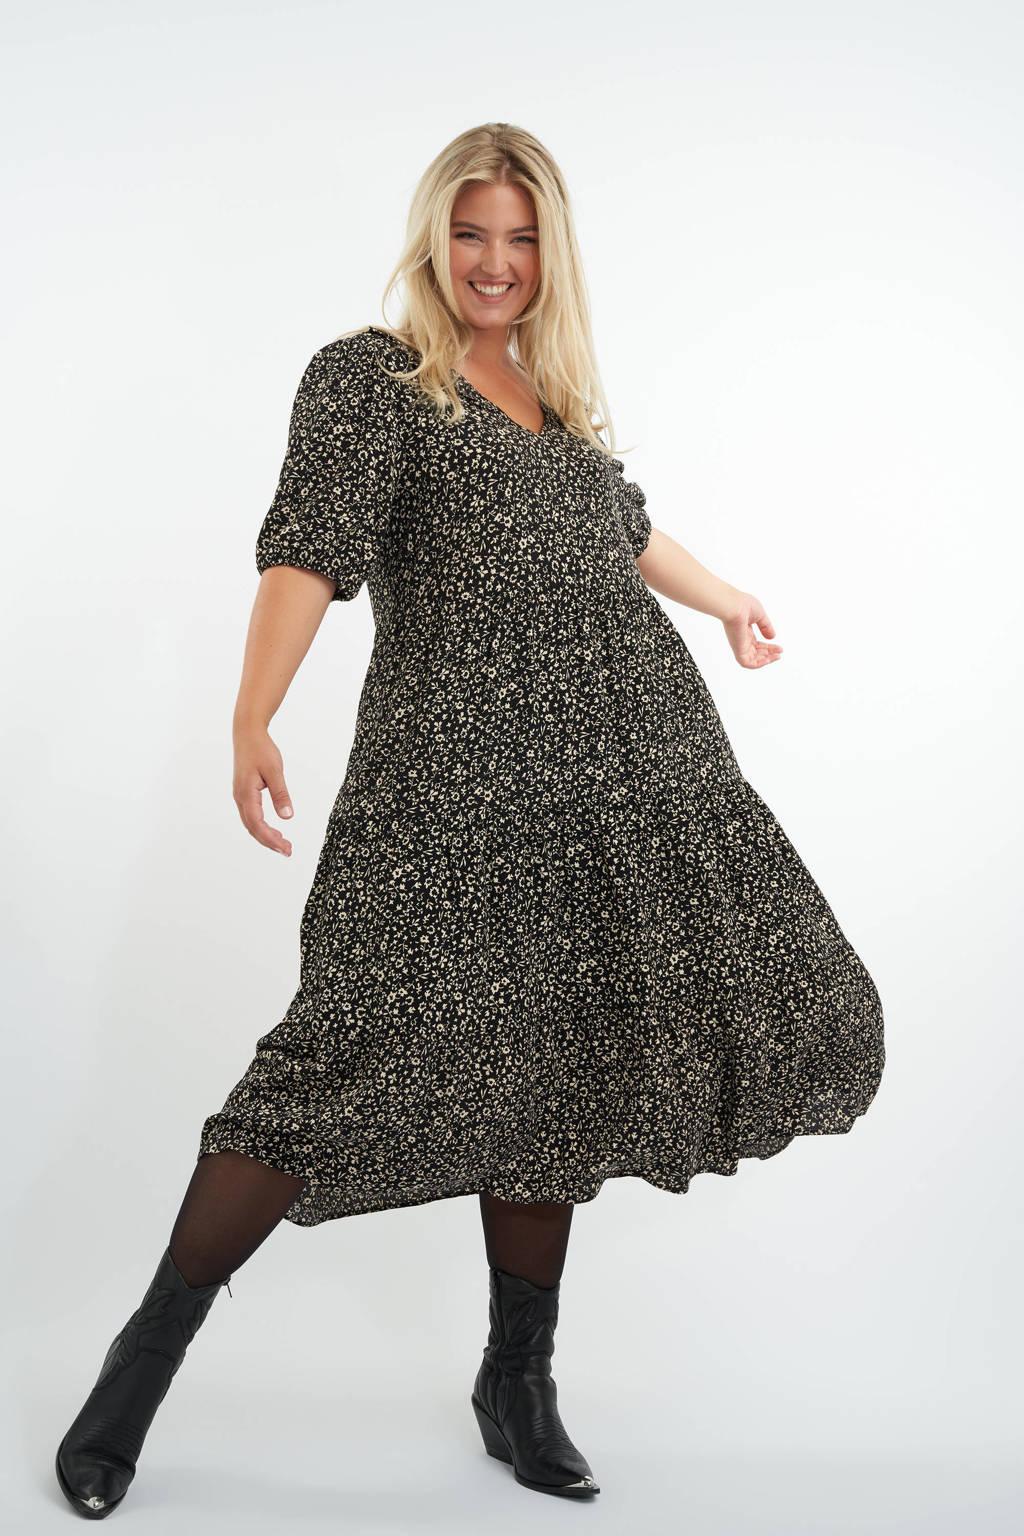 MS Mode A-lijn jurk met all over print en plooien zwart/ecru, Zwart/ecru